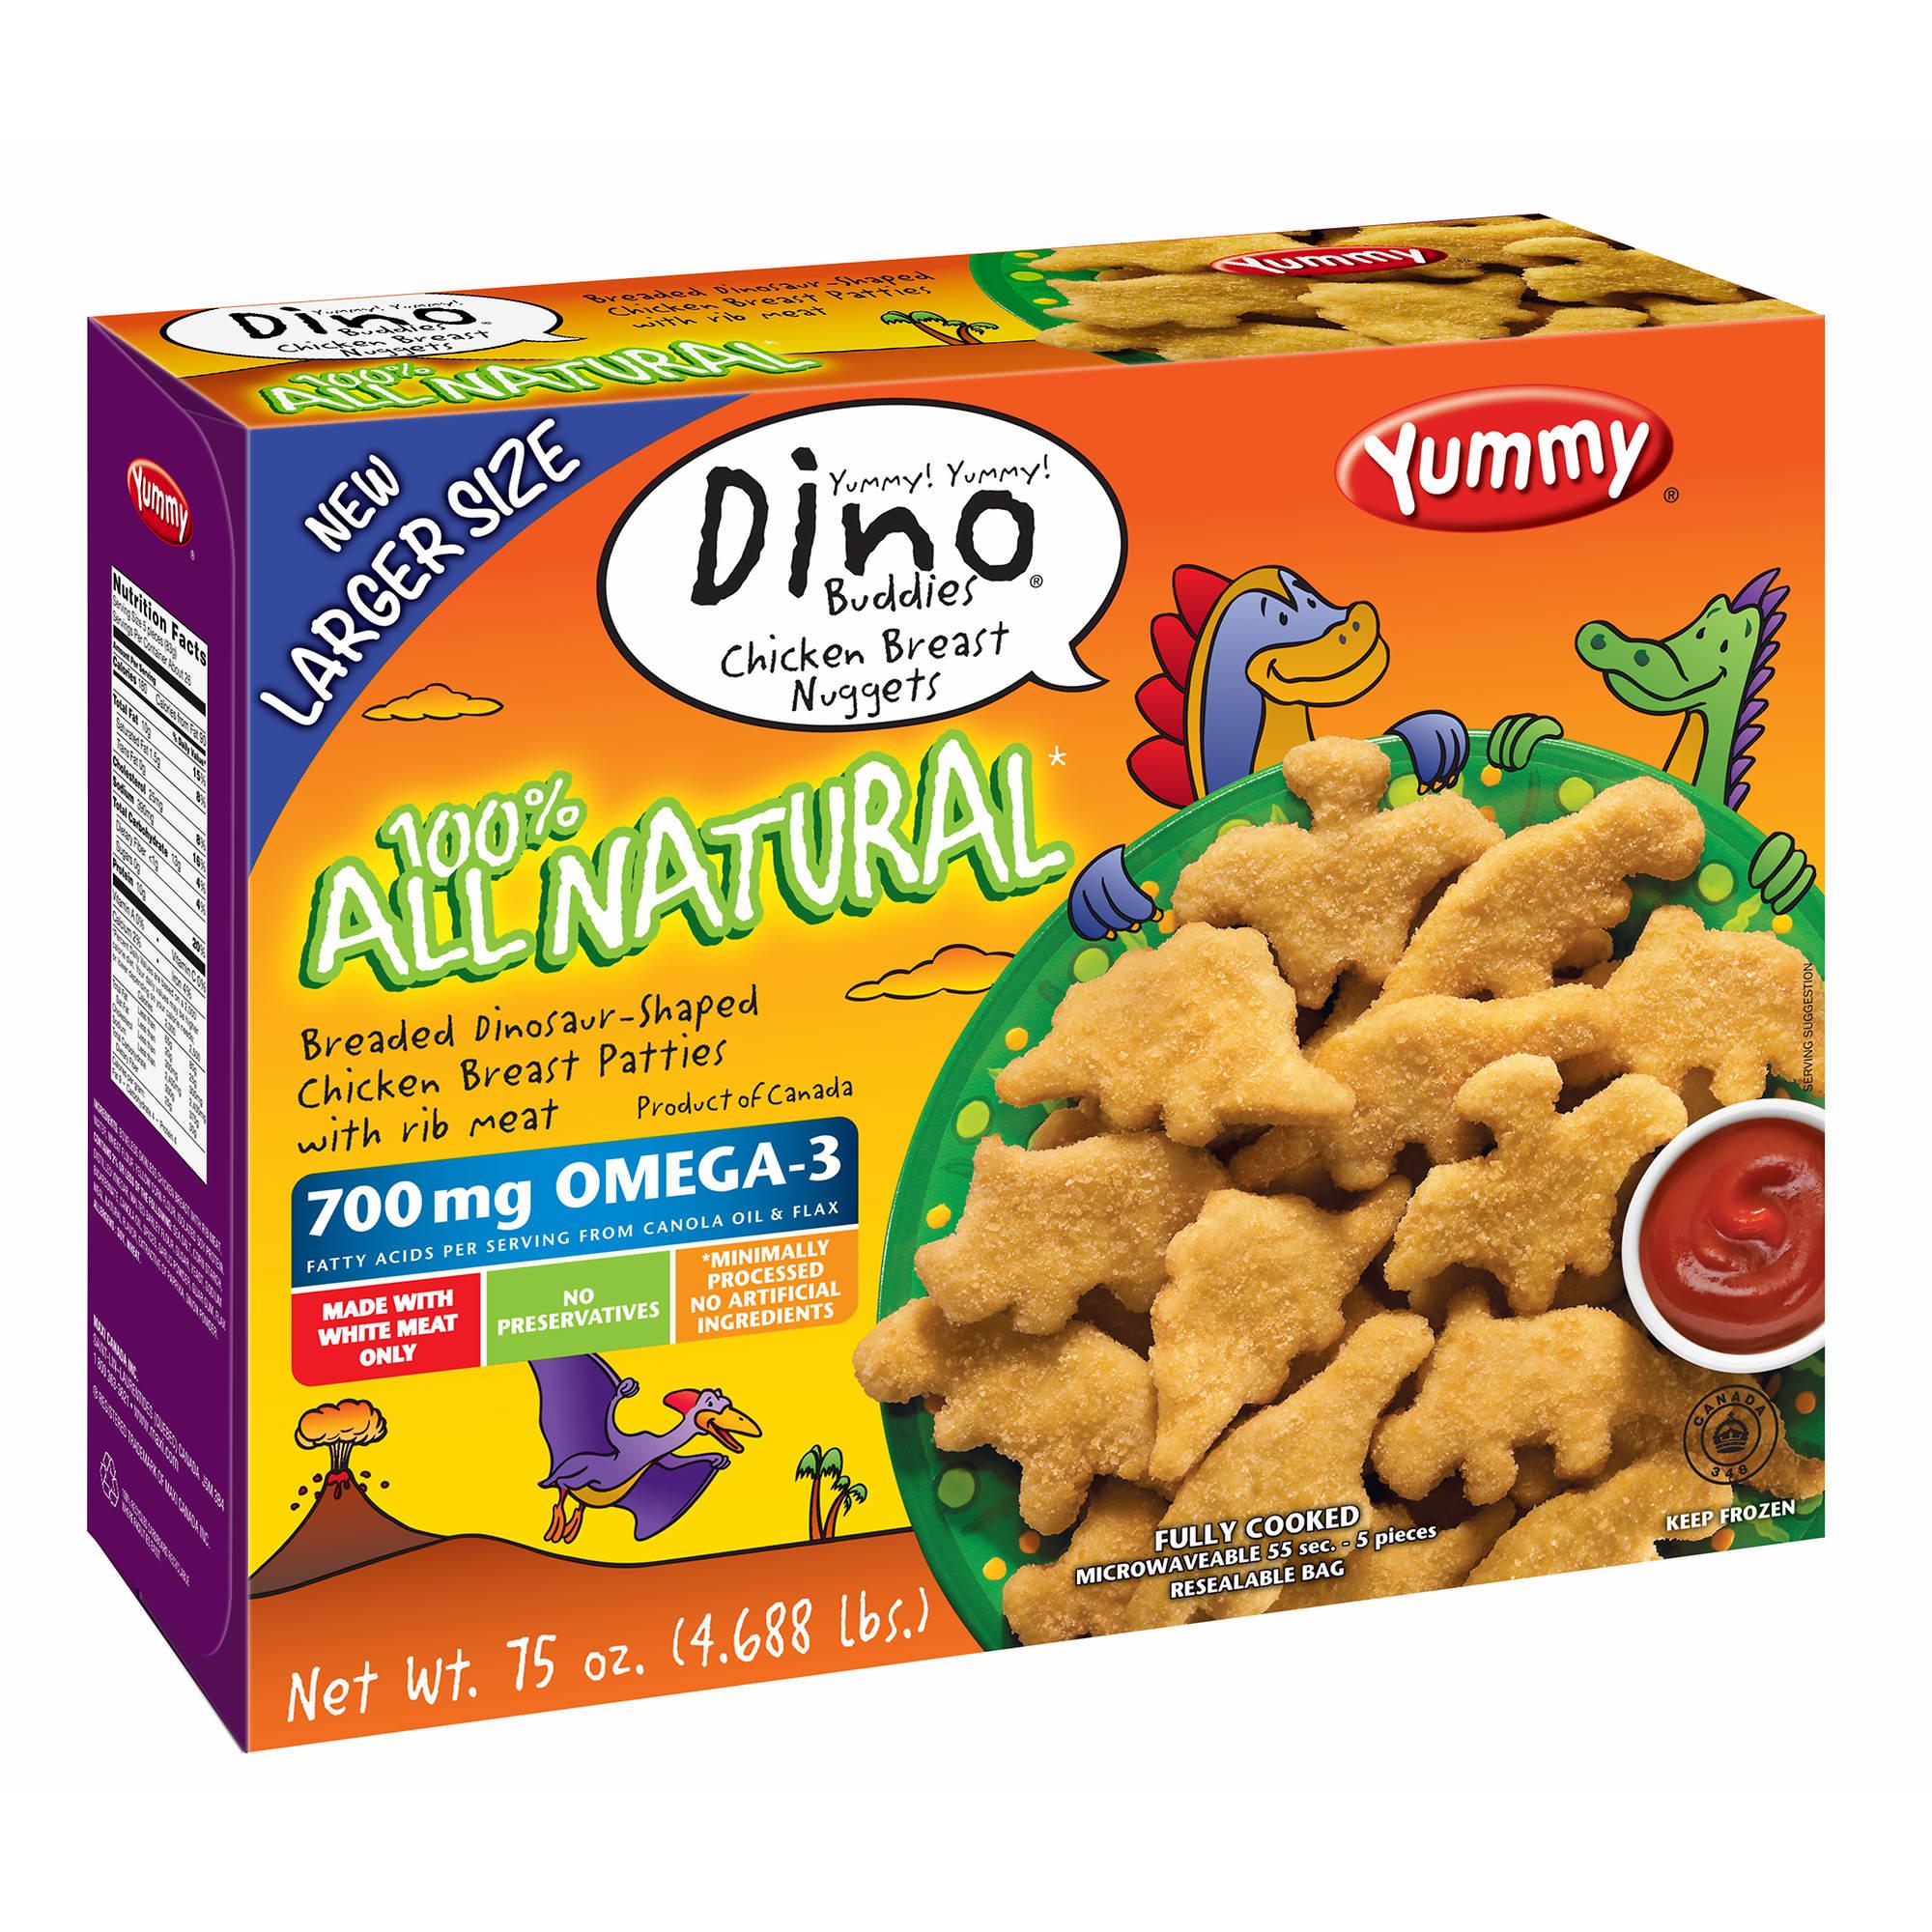 Yummy Dino Buddy All Natural Nuggets, 5 Pk./75 Oz.